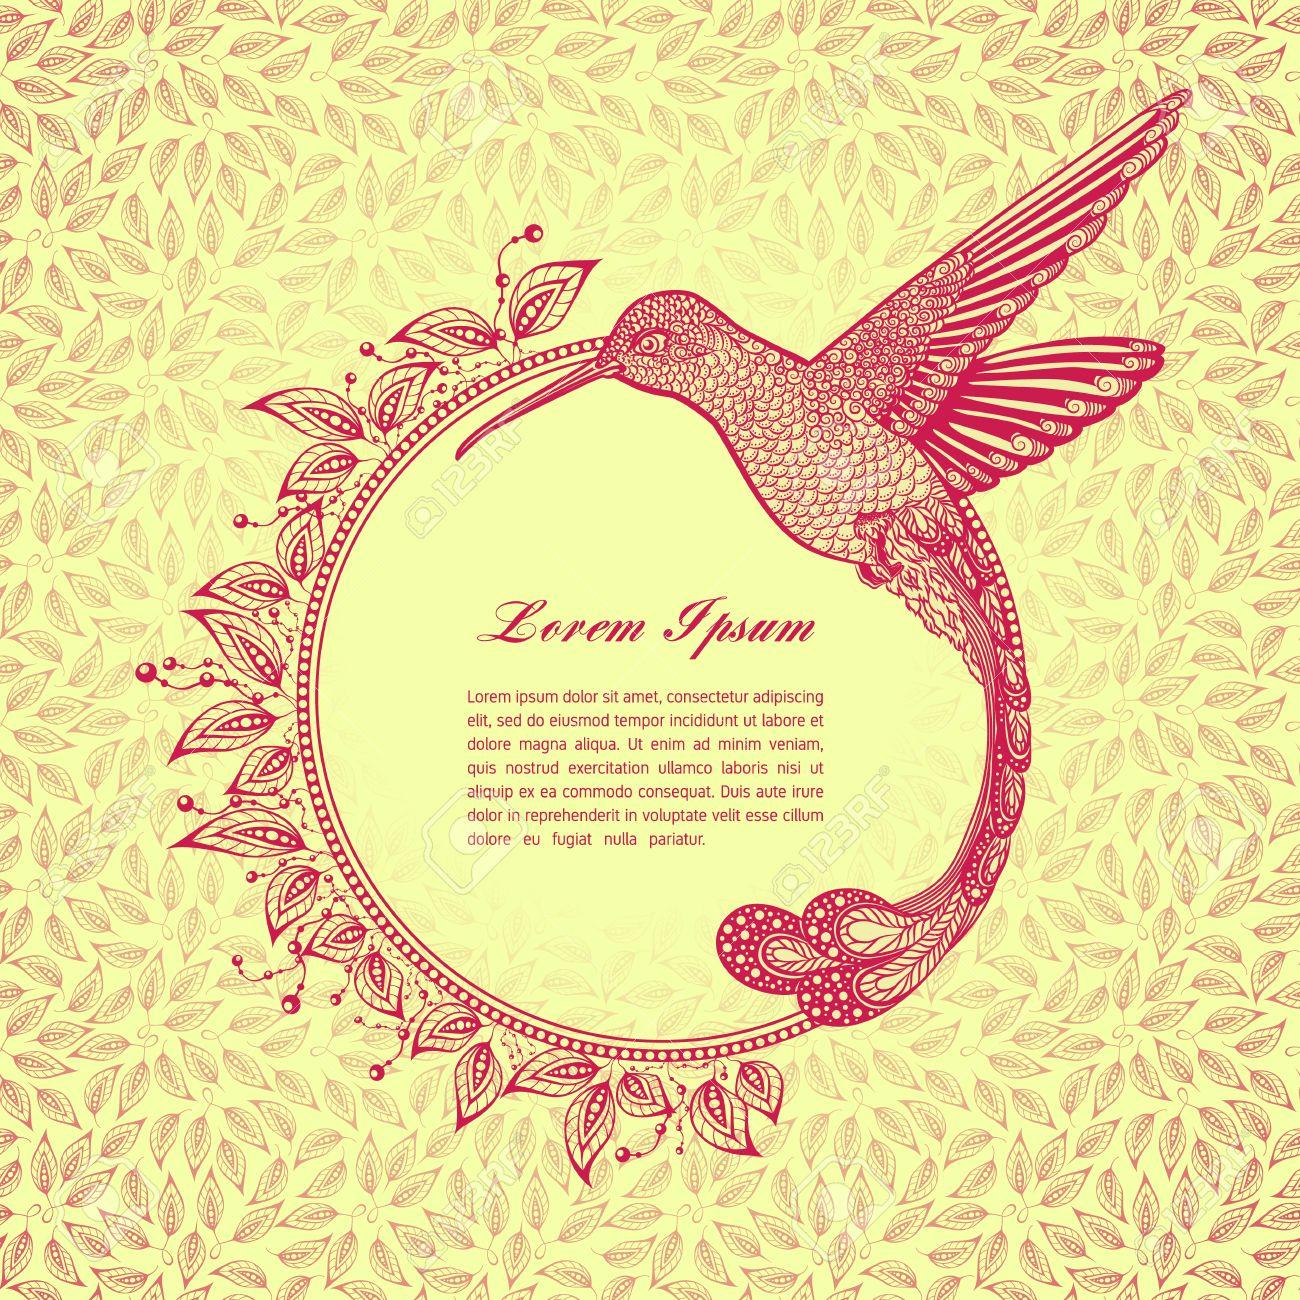 Hummingbird Tattoo. Zentangle Stil. Vector Rahmen Für Text ...